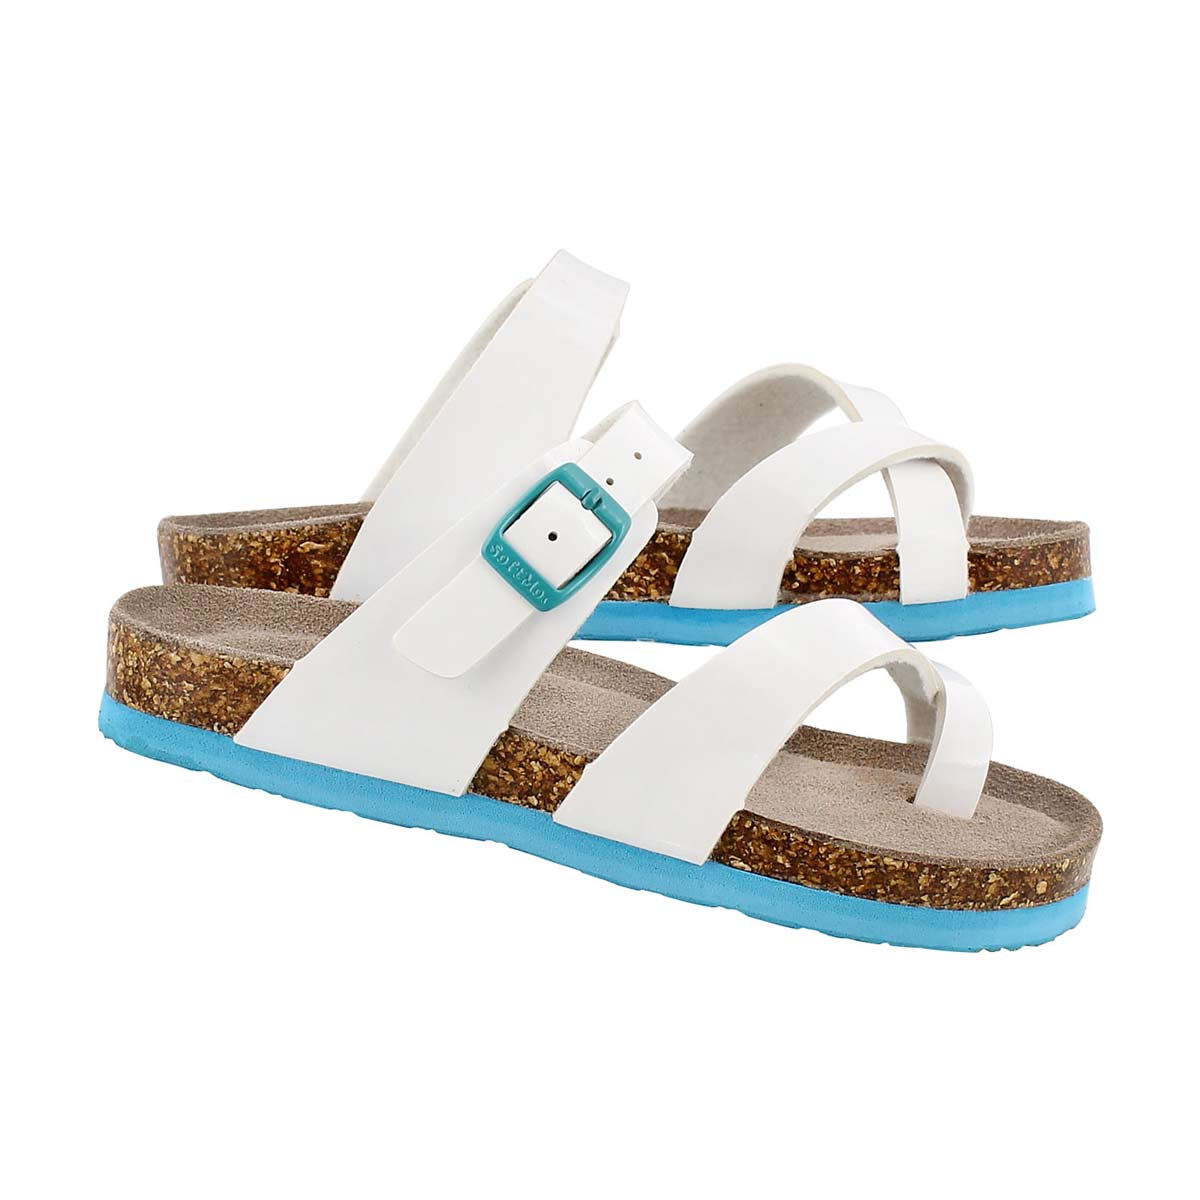 Sandale Alicia, cuir verni blanc, filles